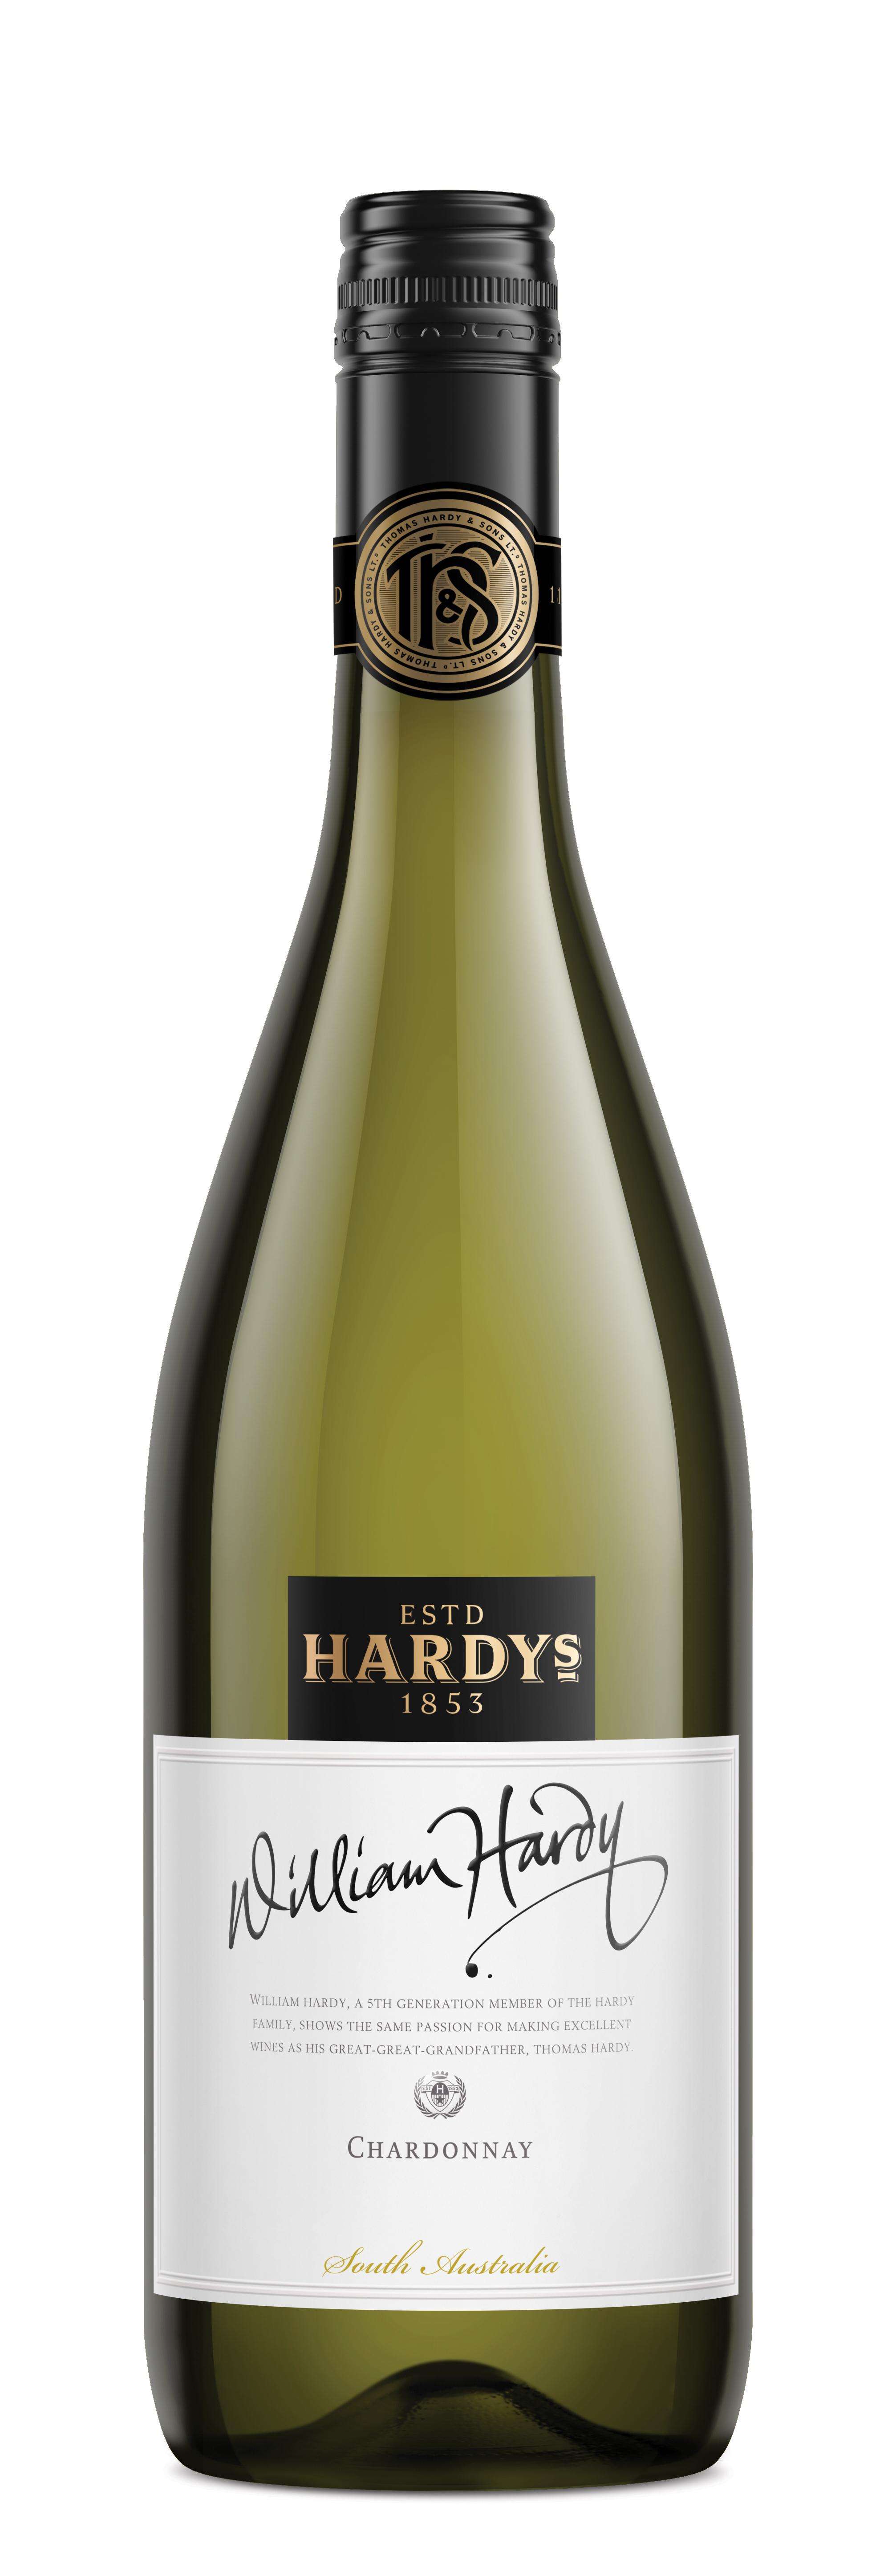 The William Hardy Chardonnay 2013